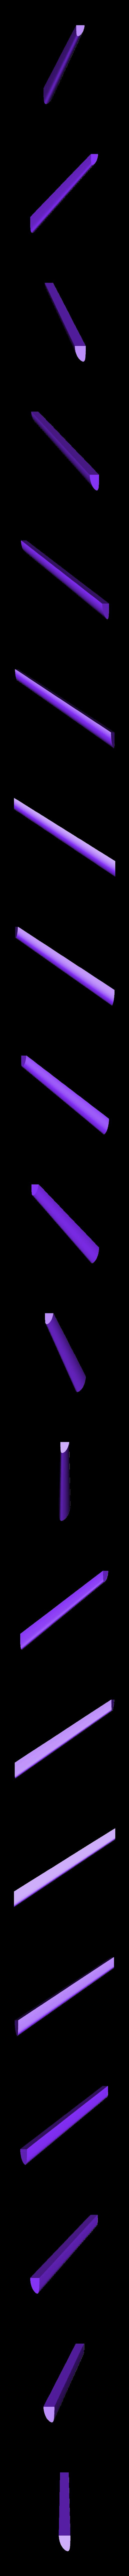 inner_wing_2.stl Download free STL file Leading-Edge Slats for Horten Wing Stiletto • 3D printer model, wersy